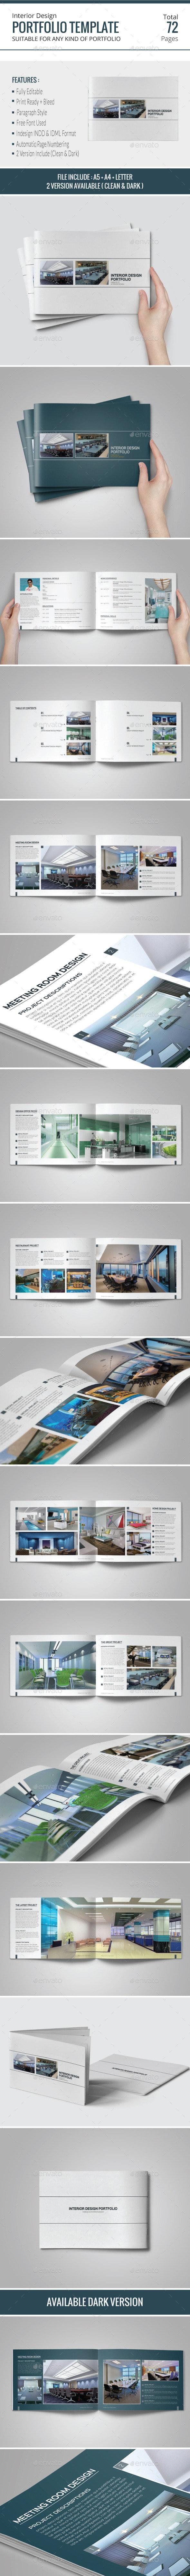 home interior design magazine pdf template